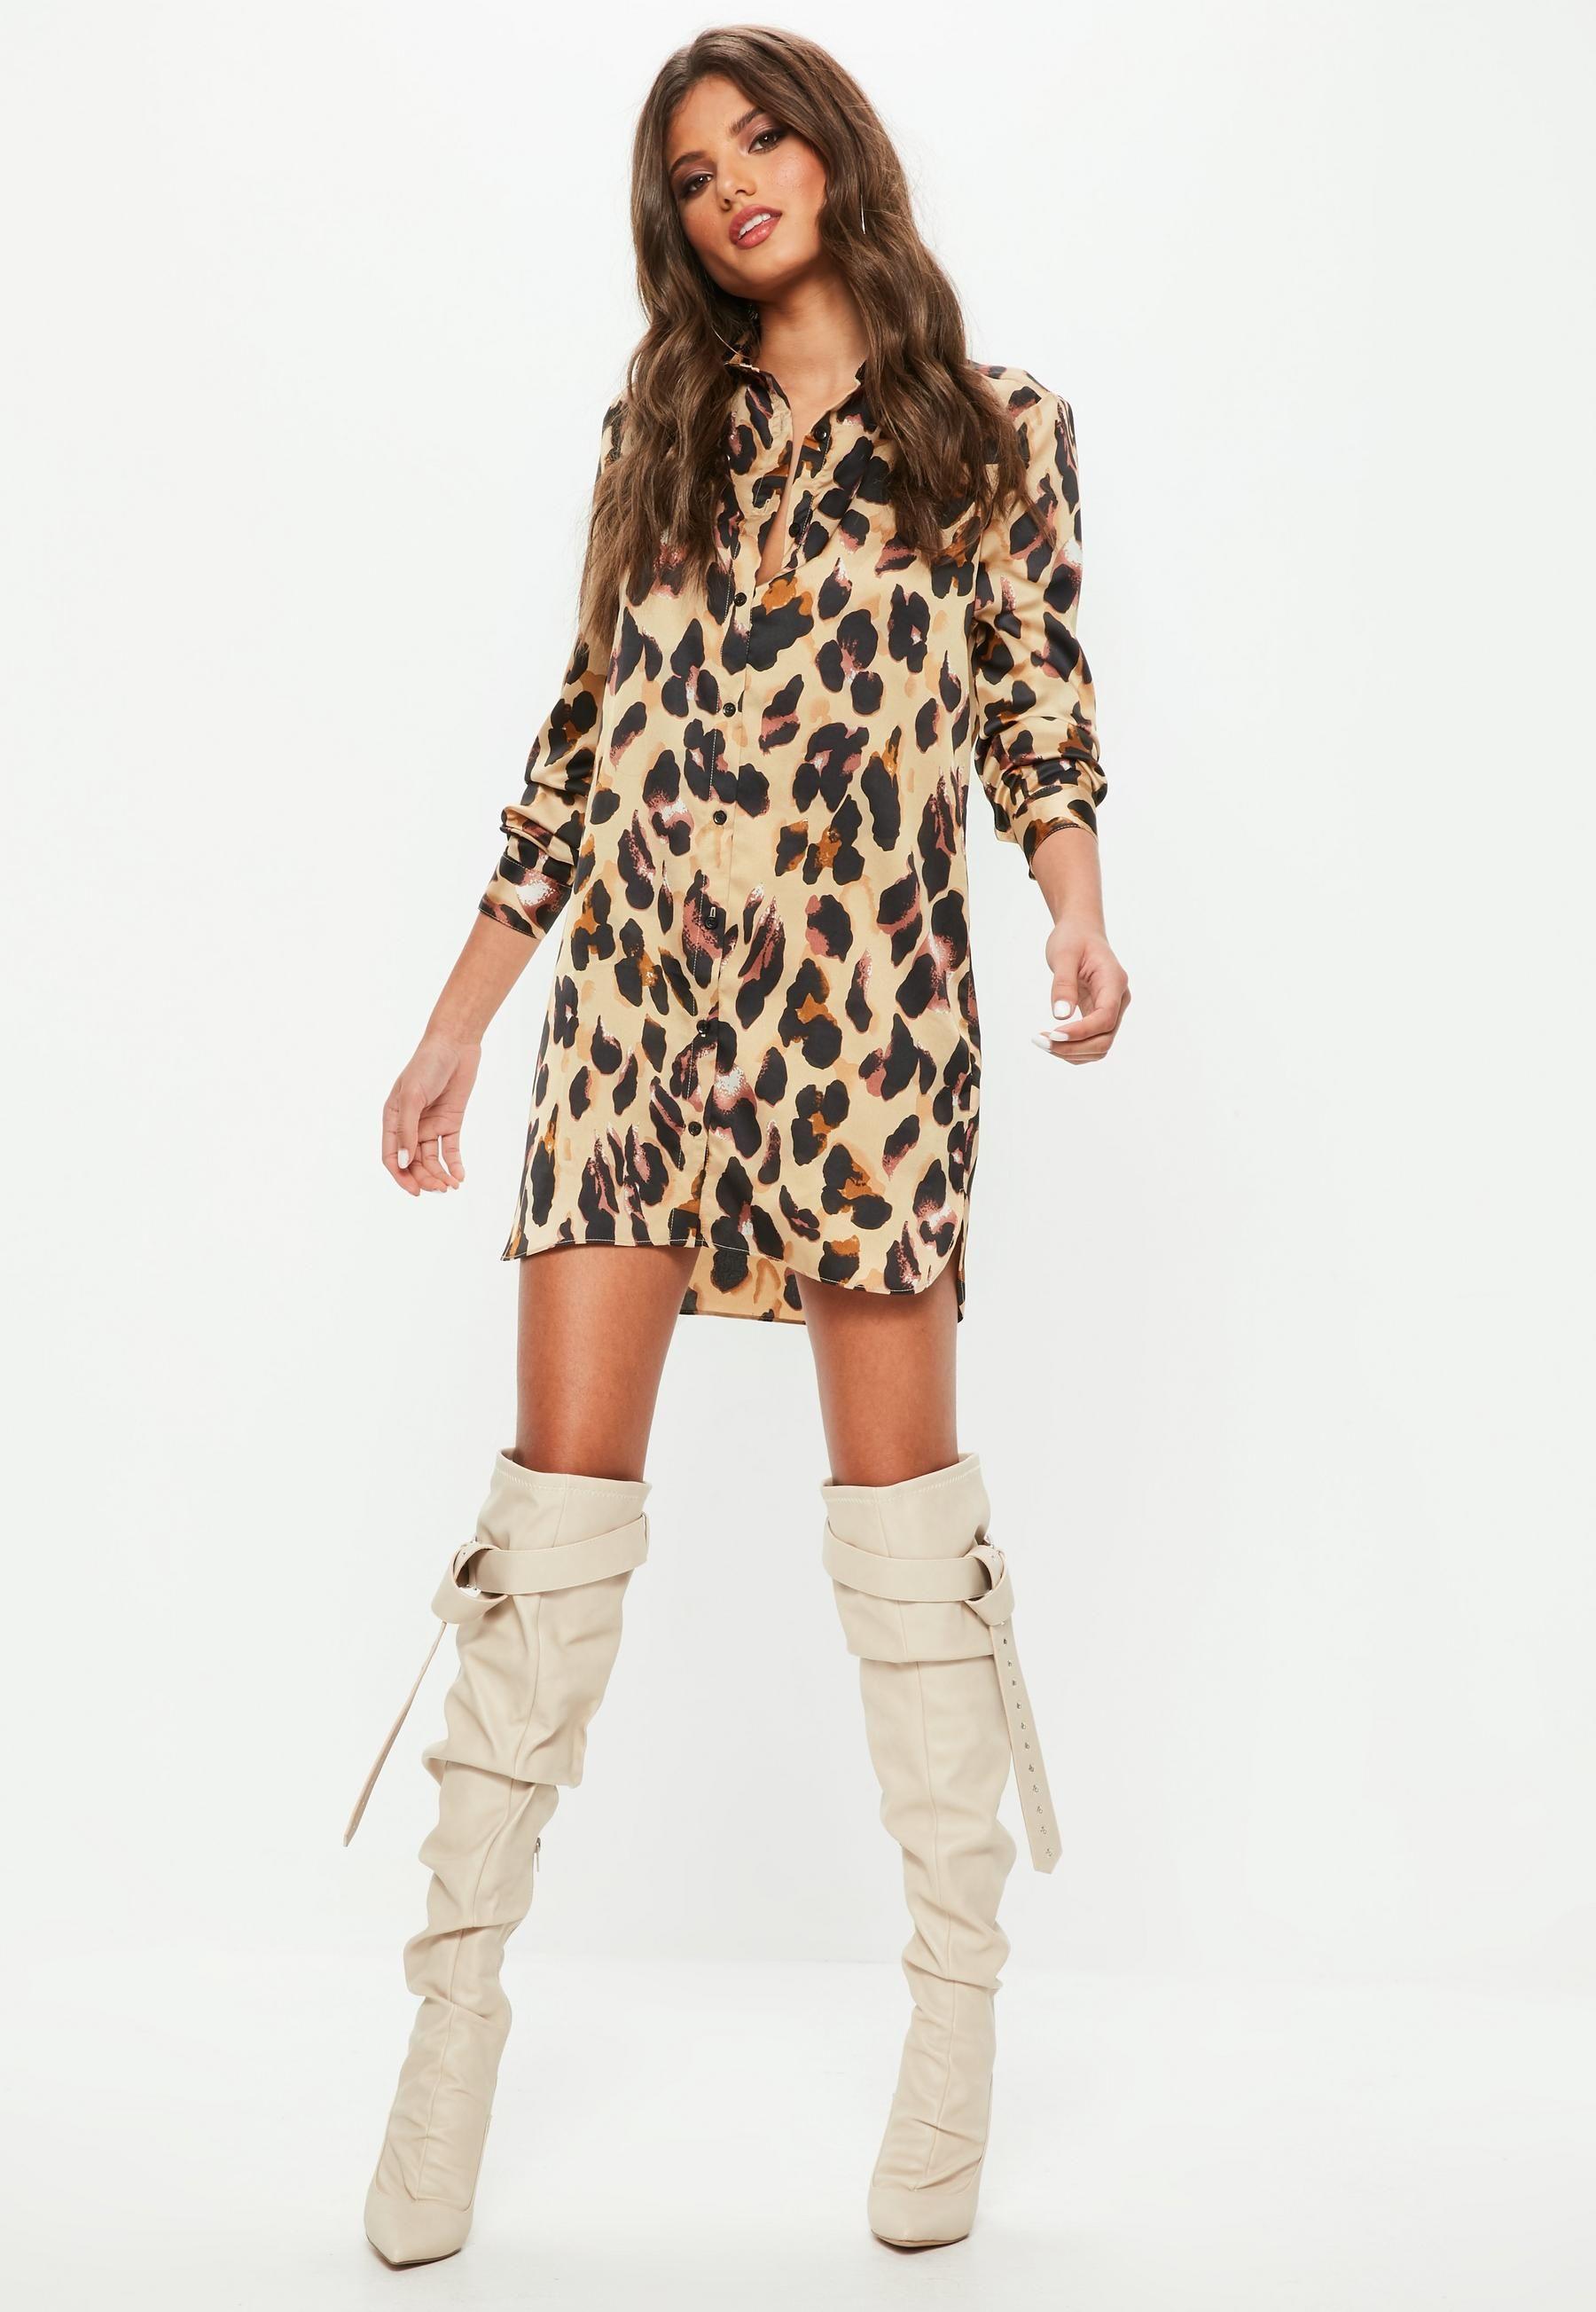 0a7c4814095 Missguided Brown Leopard Print Satin Shirt Dress